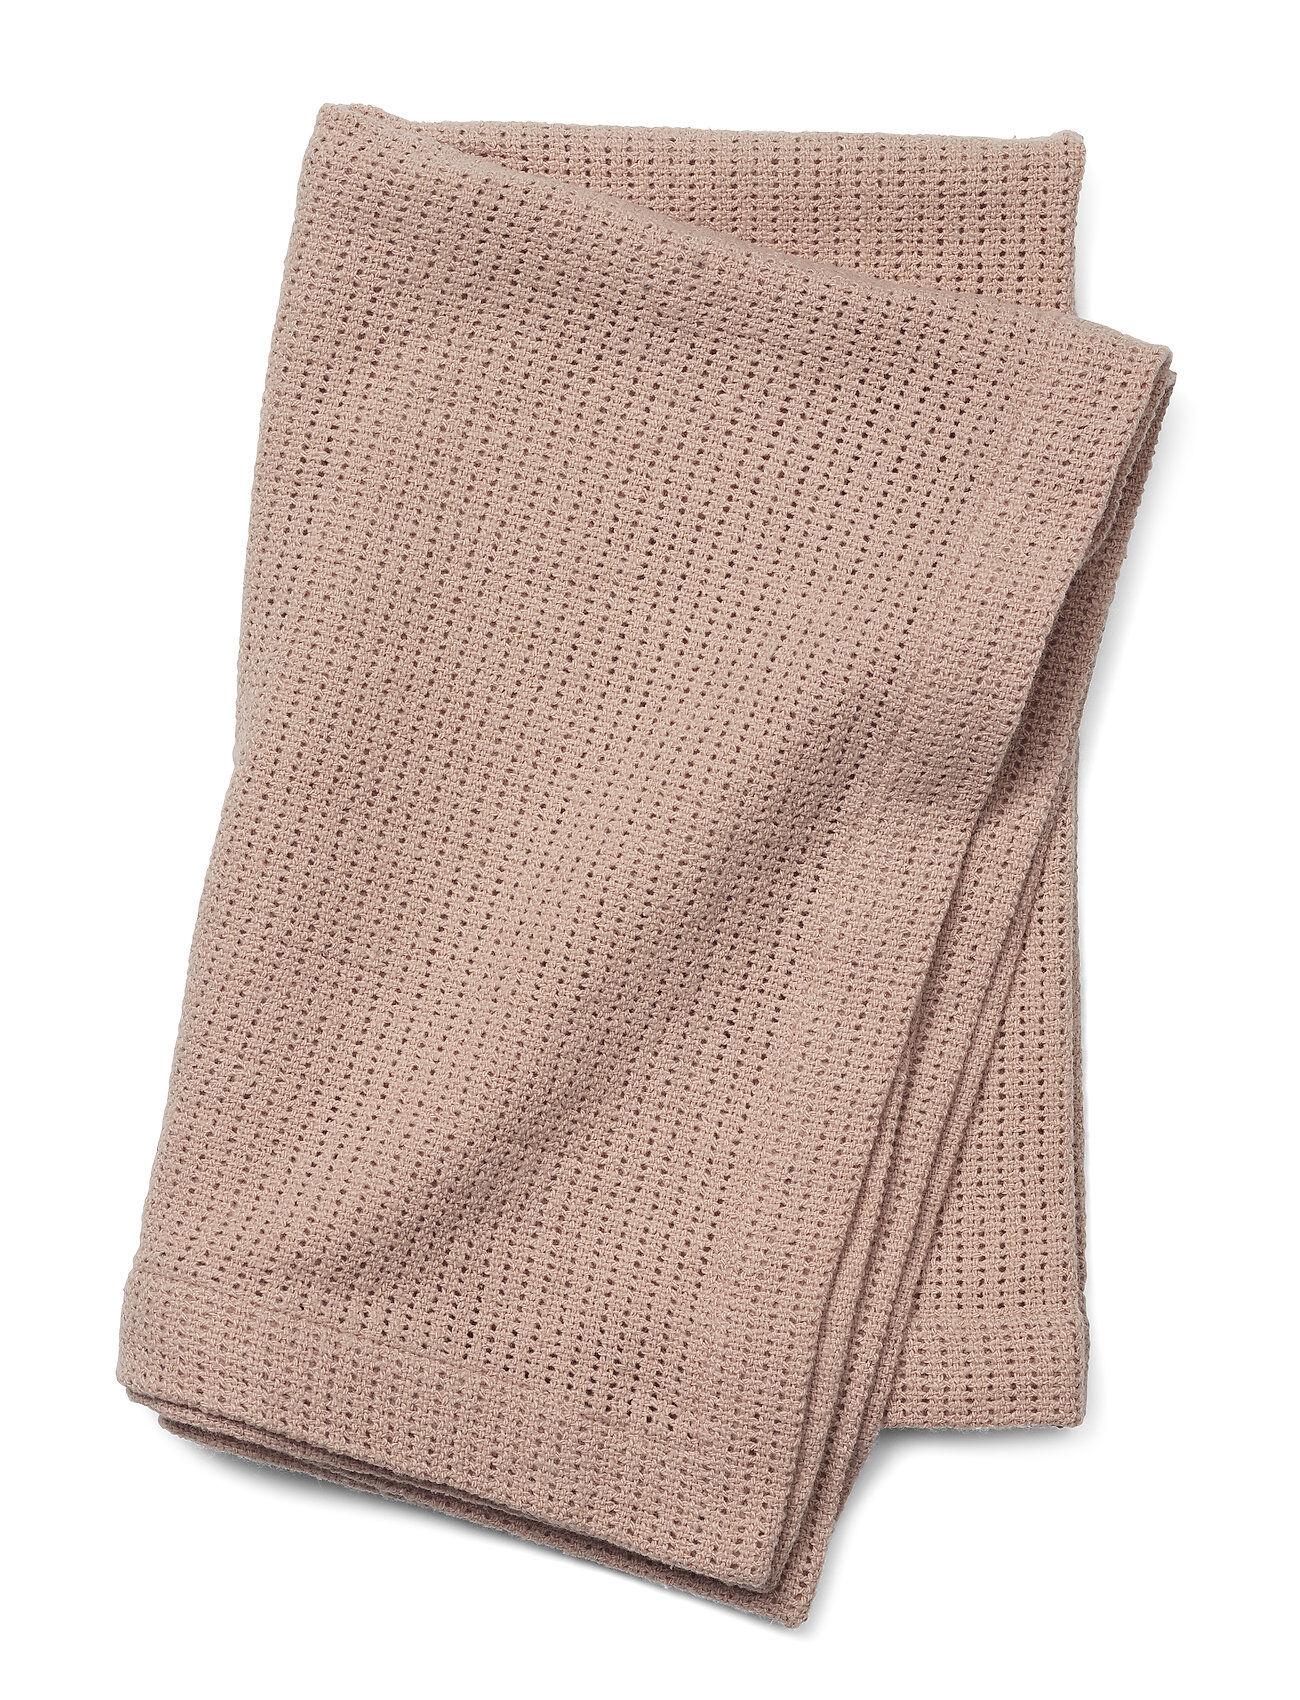 Elodie Details Cellular Blanket - Powder Pink Home Sleep Time Blankets & Quilts Vaaleanpunainen Elodie Details